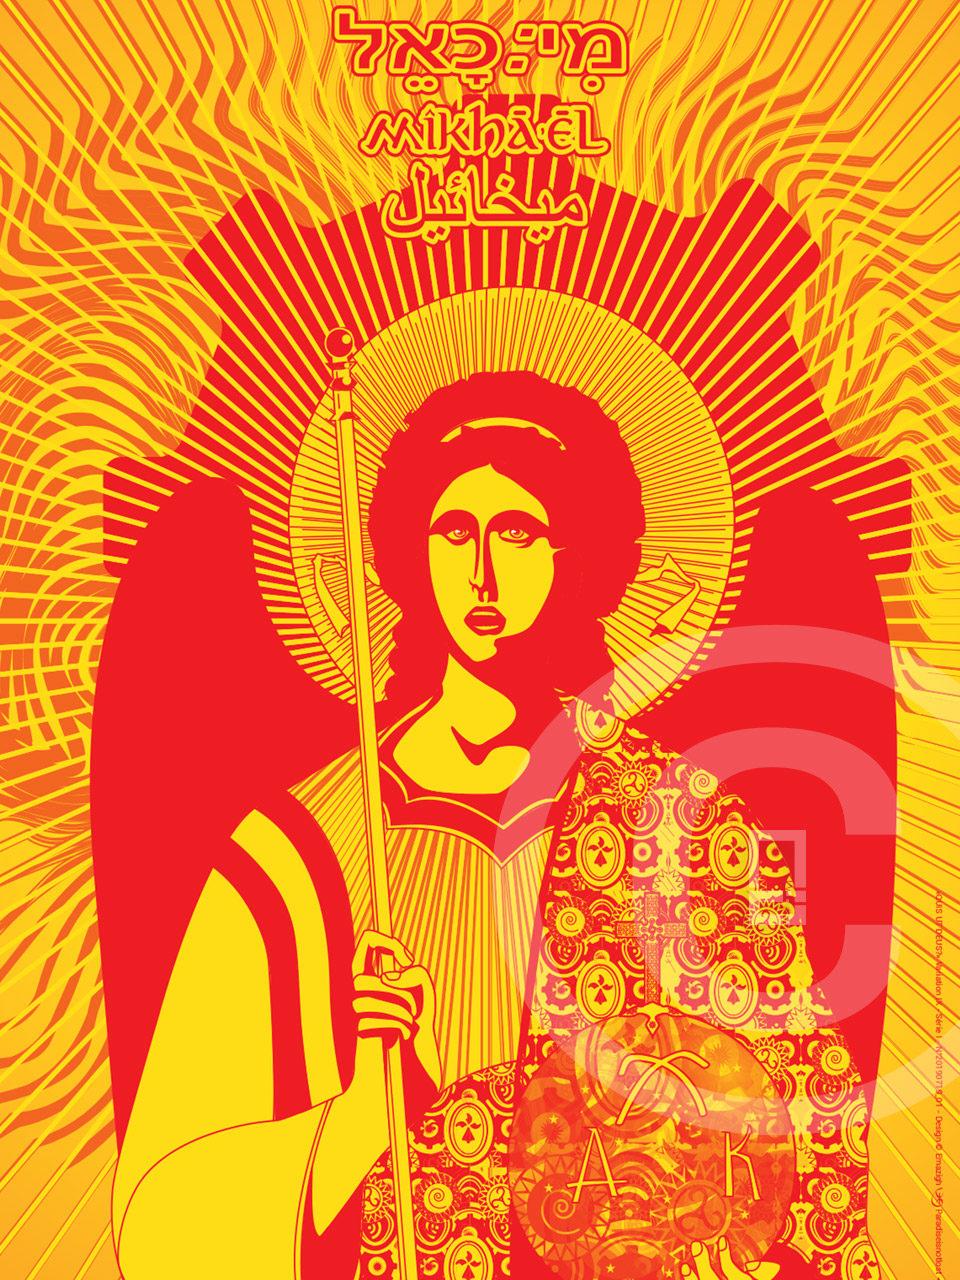 Icône digitale Saint-Michel Archange Ar Seiz Breur